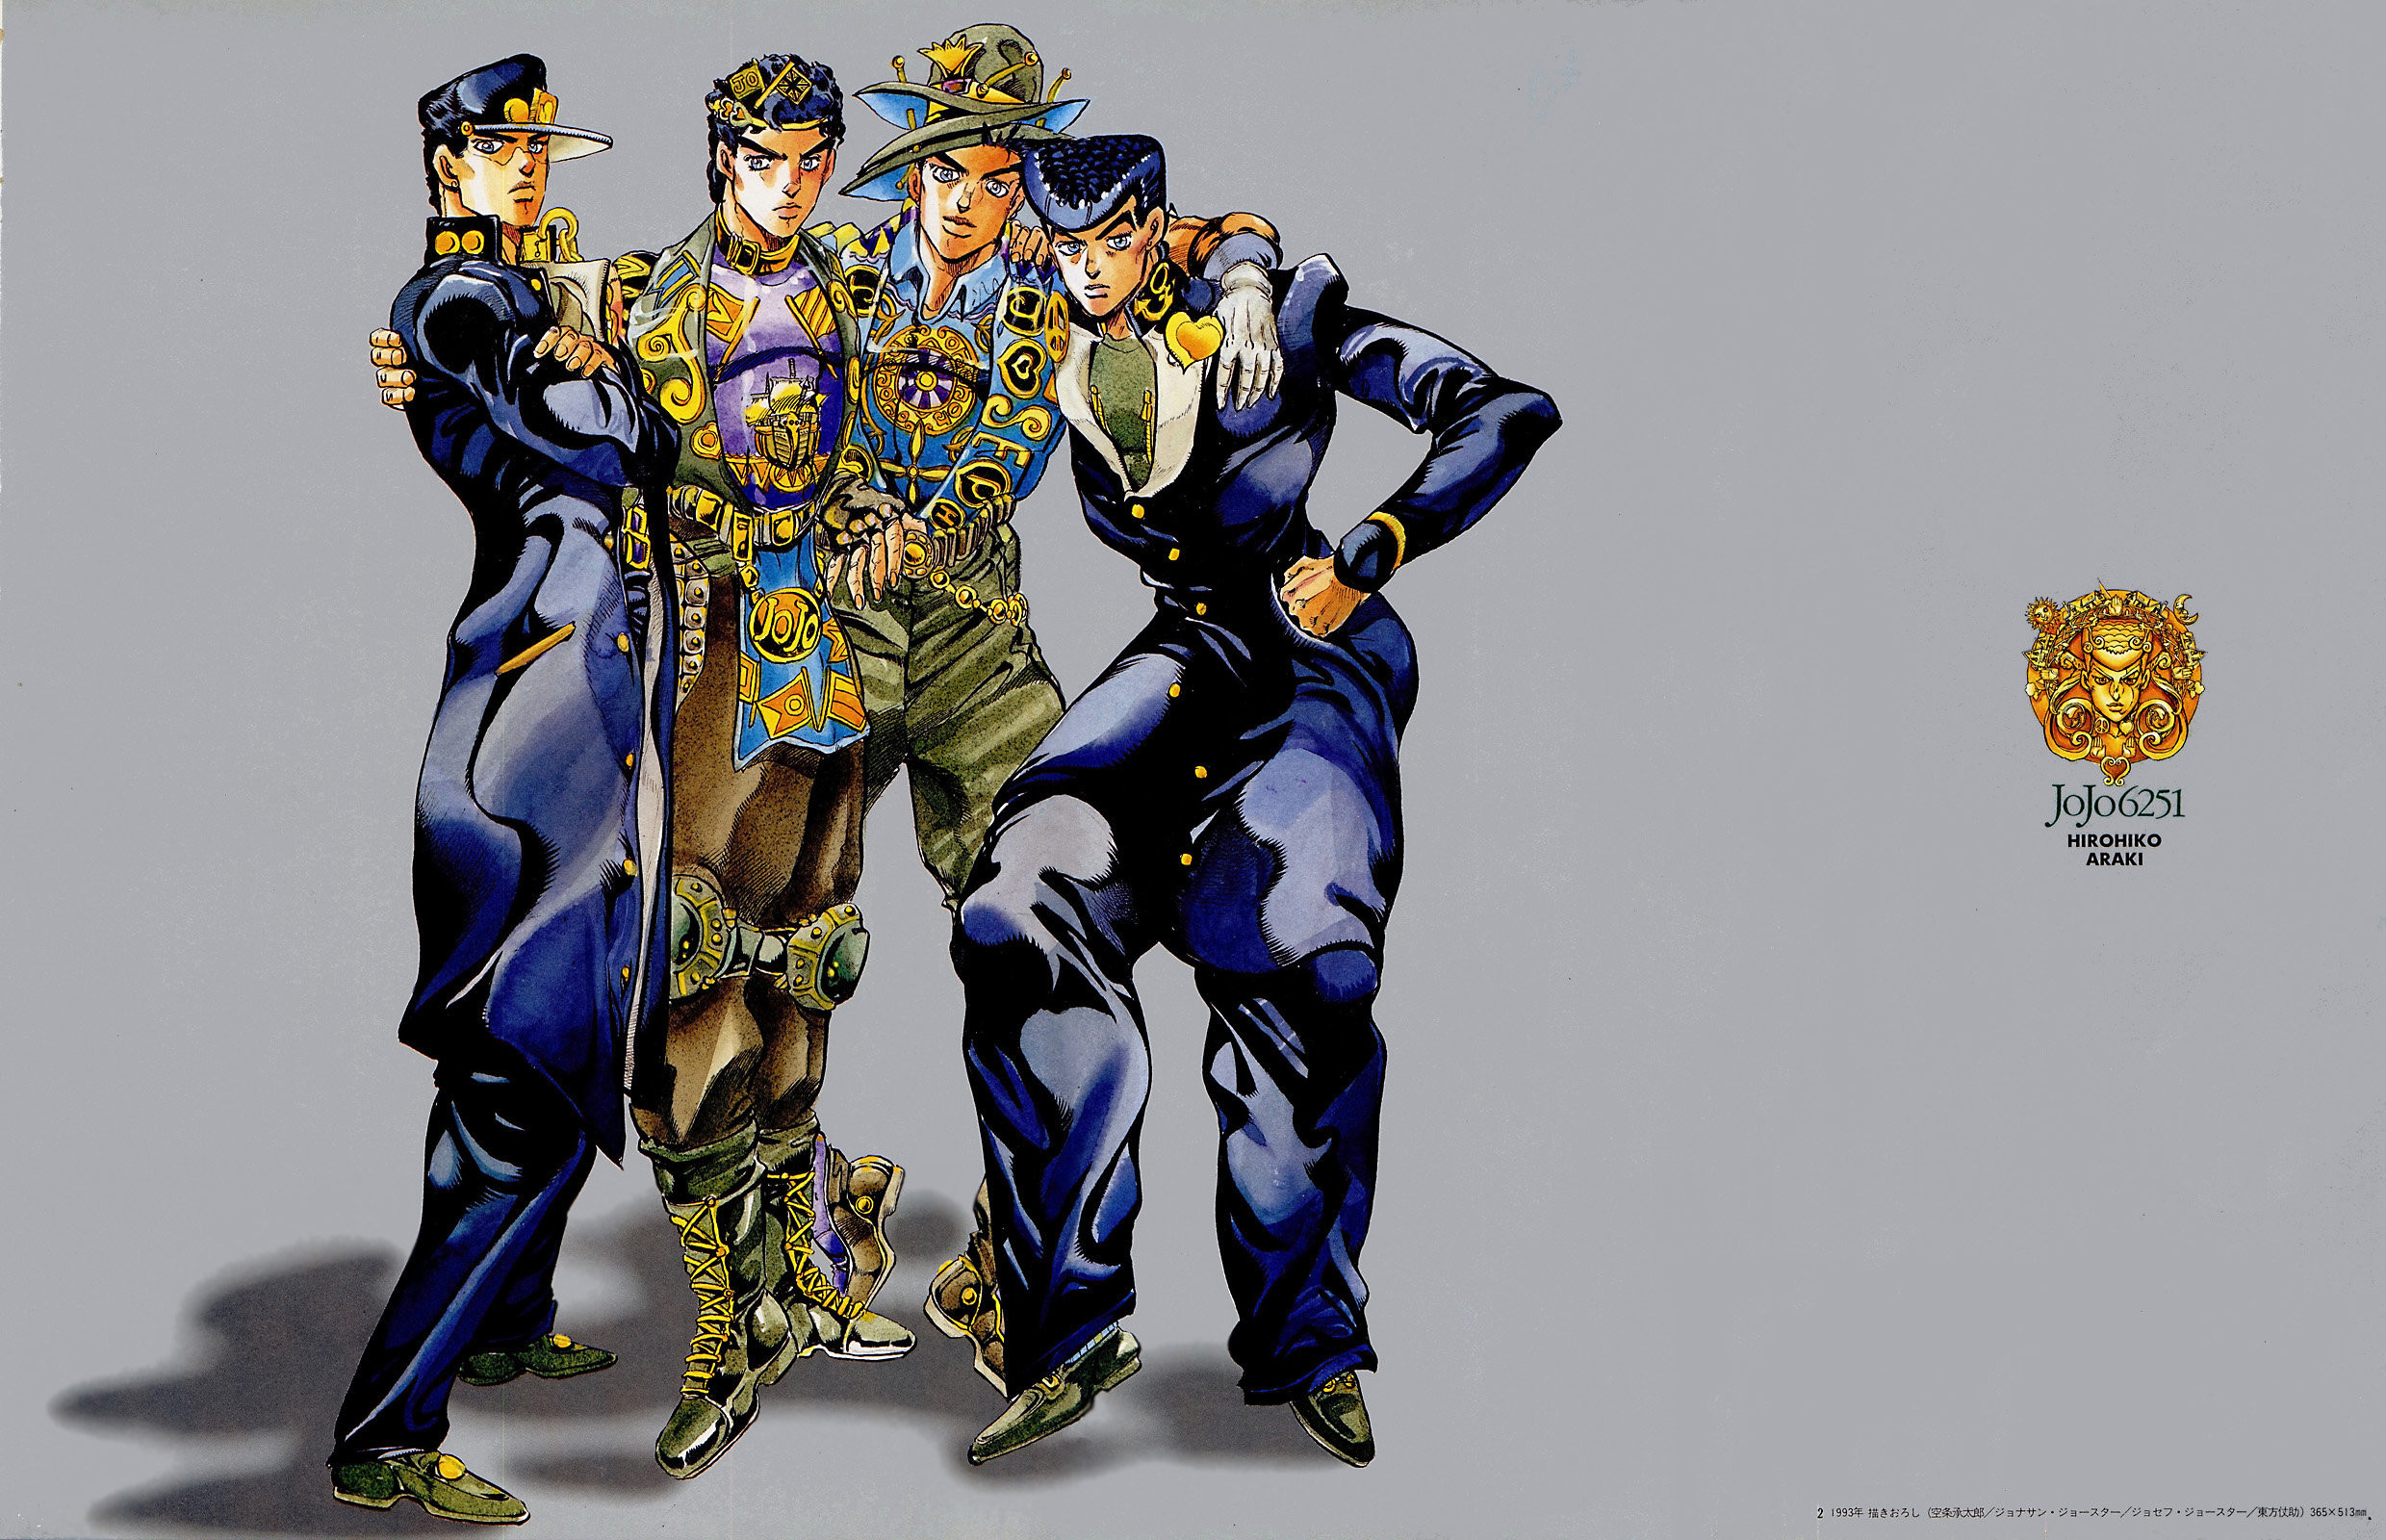 JoJo's Bizarre Adventure: Diamond is Unbreakable 啊OT啊 What a Beautiful  Duwang – Page 40 – NeoGAF